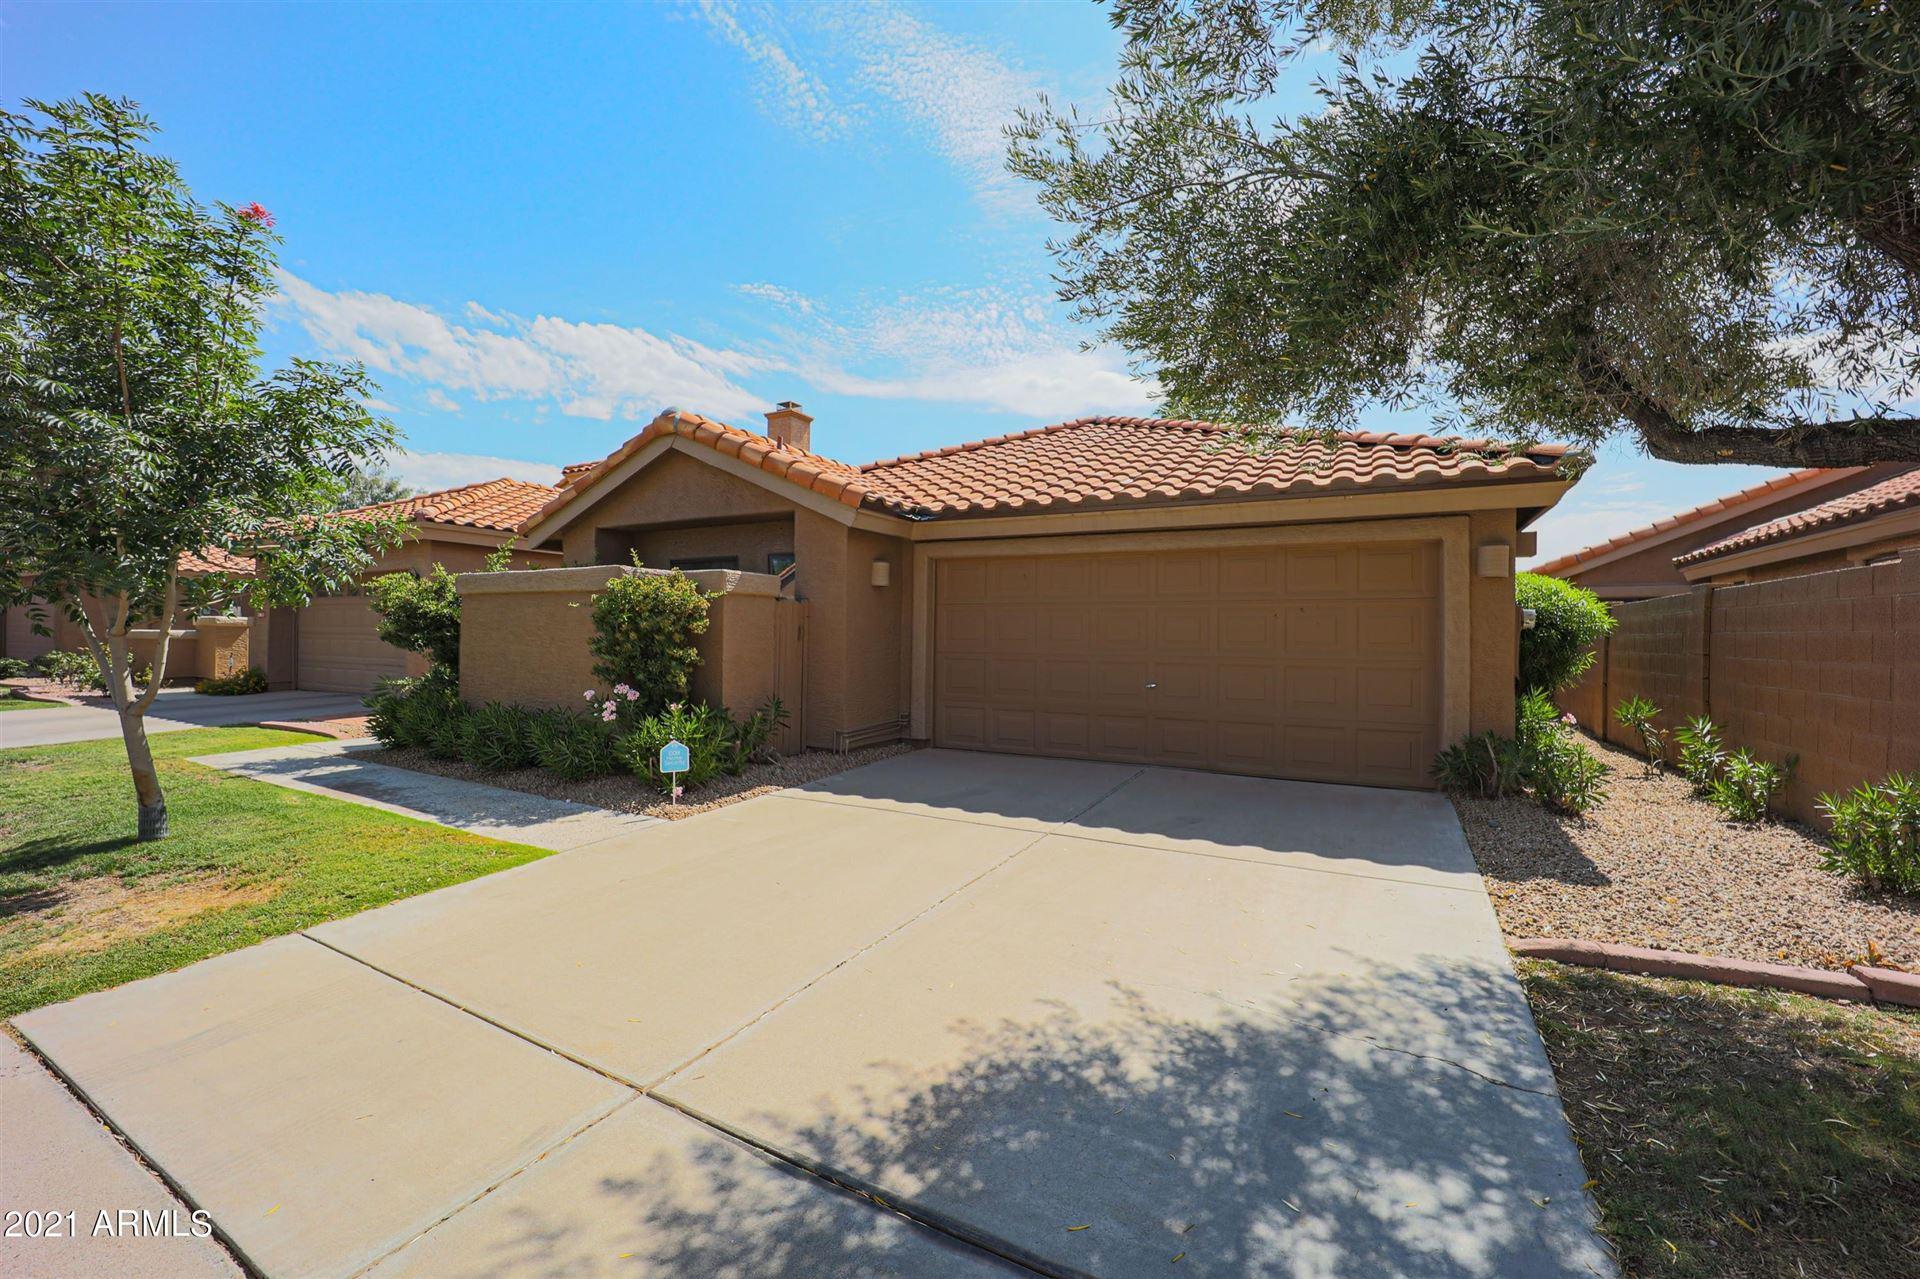 Photo of 15607 N 50TH Street, Scottsdale, AZ 85254 (MLS # 6249792)